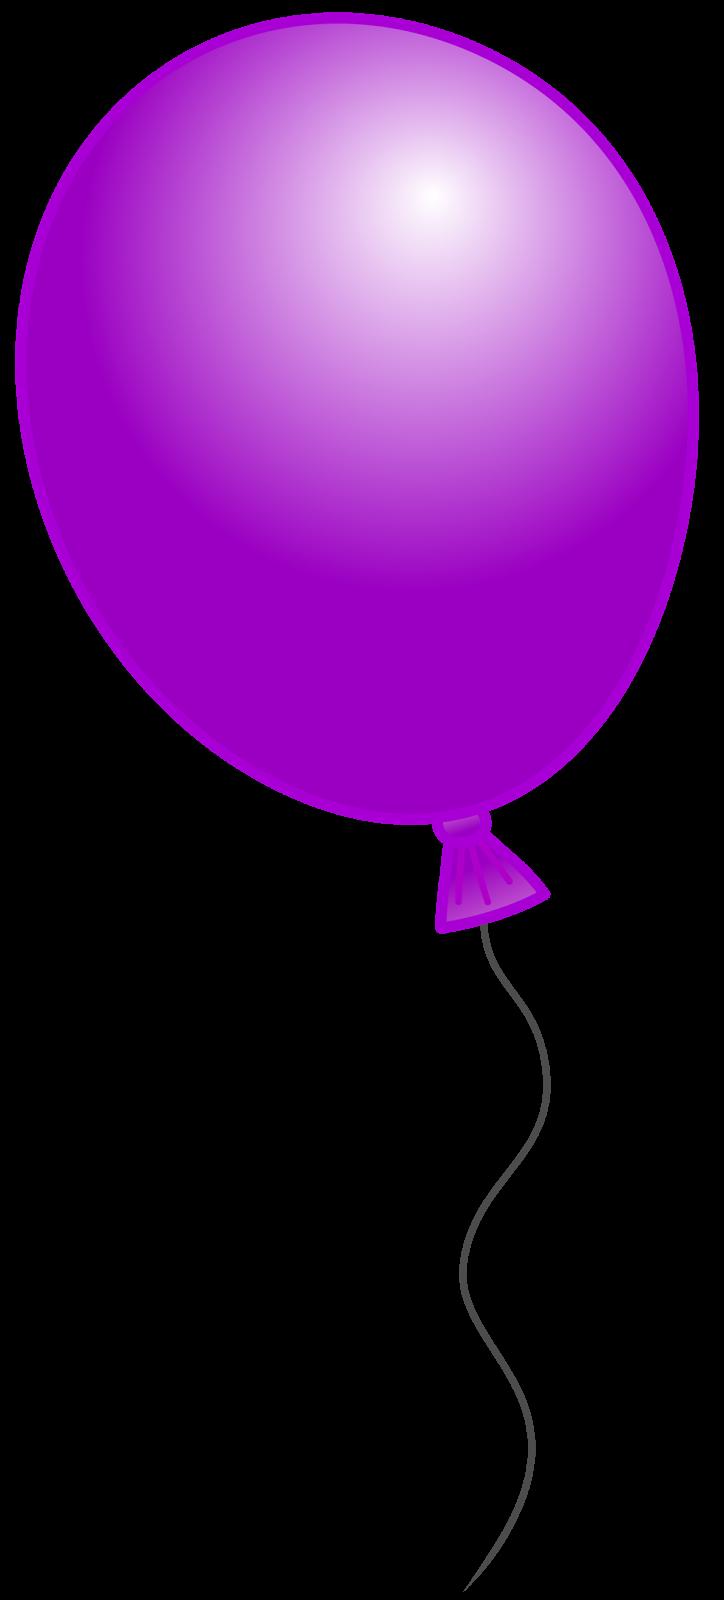 Clipart balloon single.  collection of high